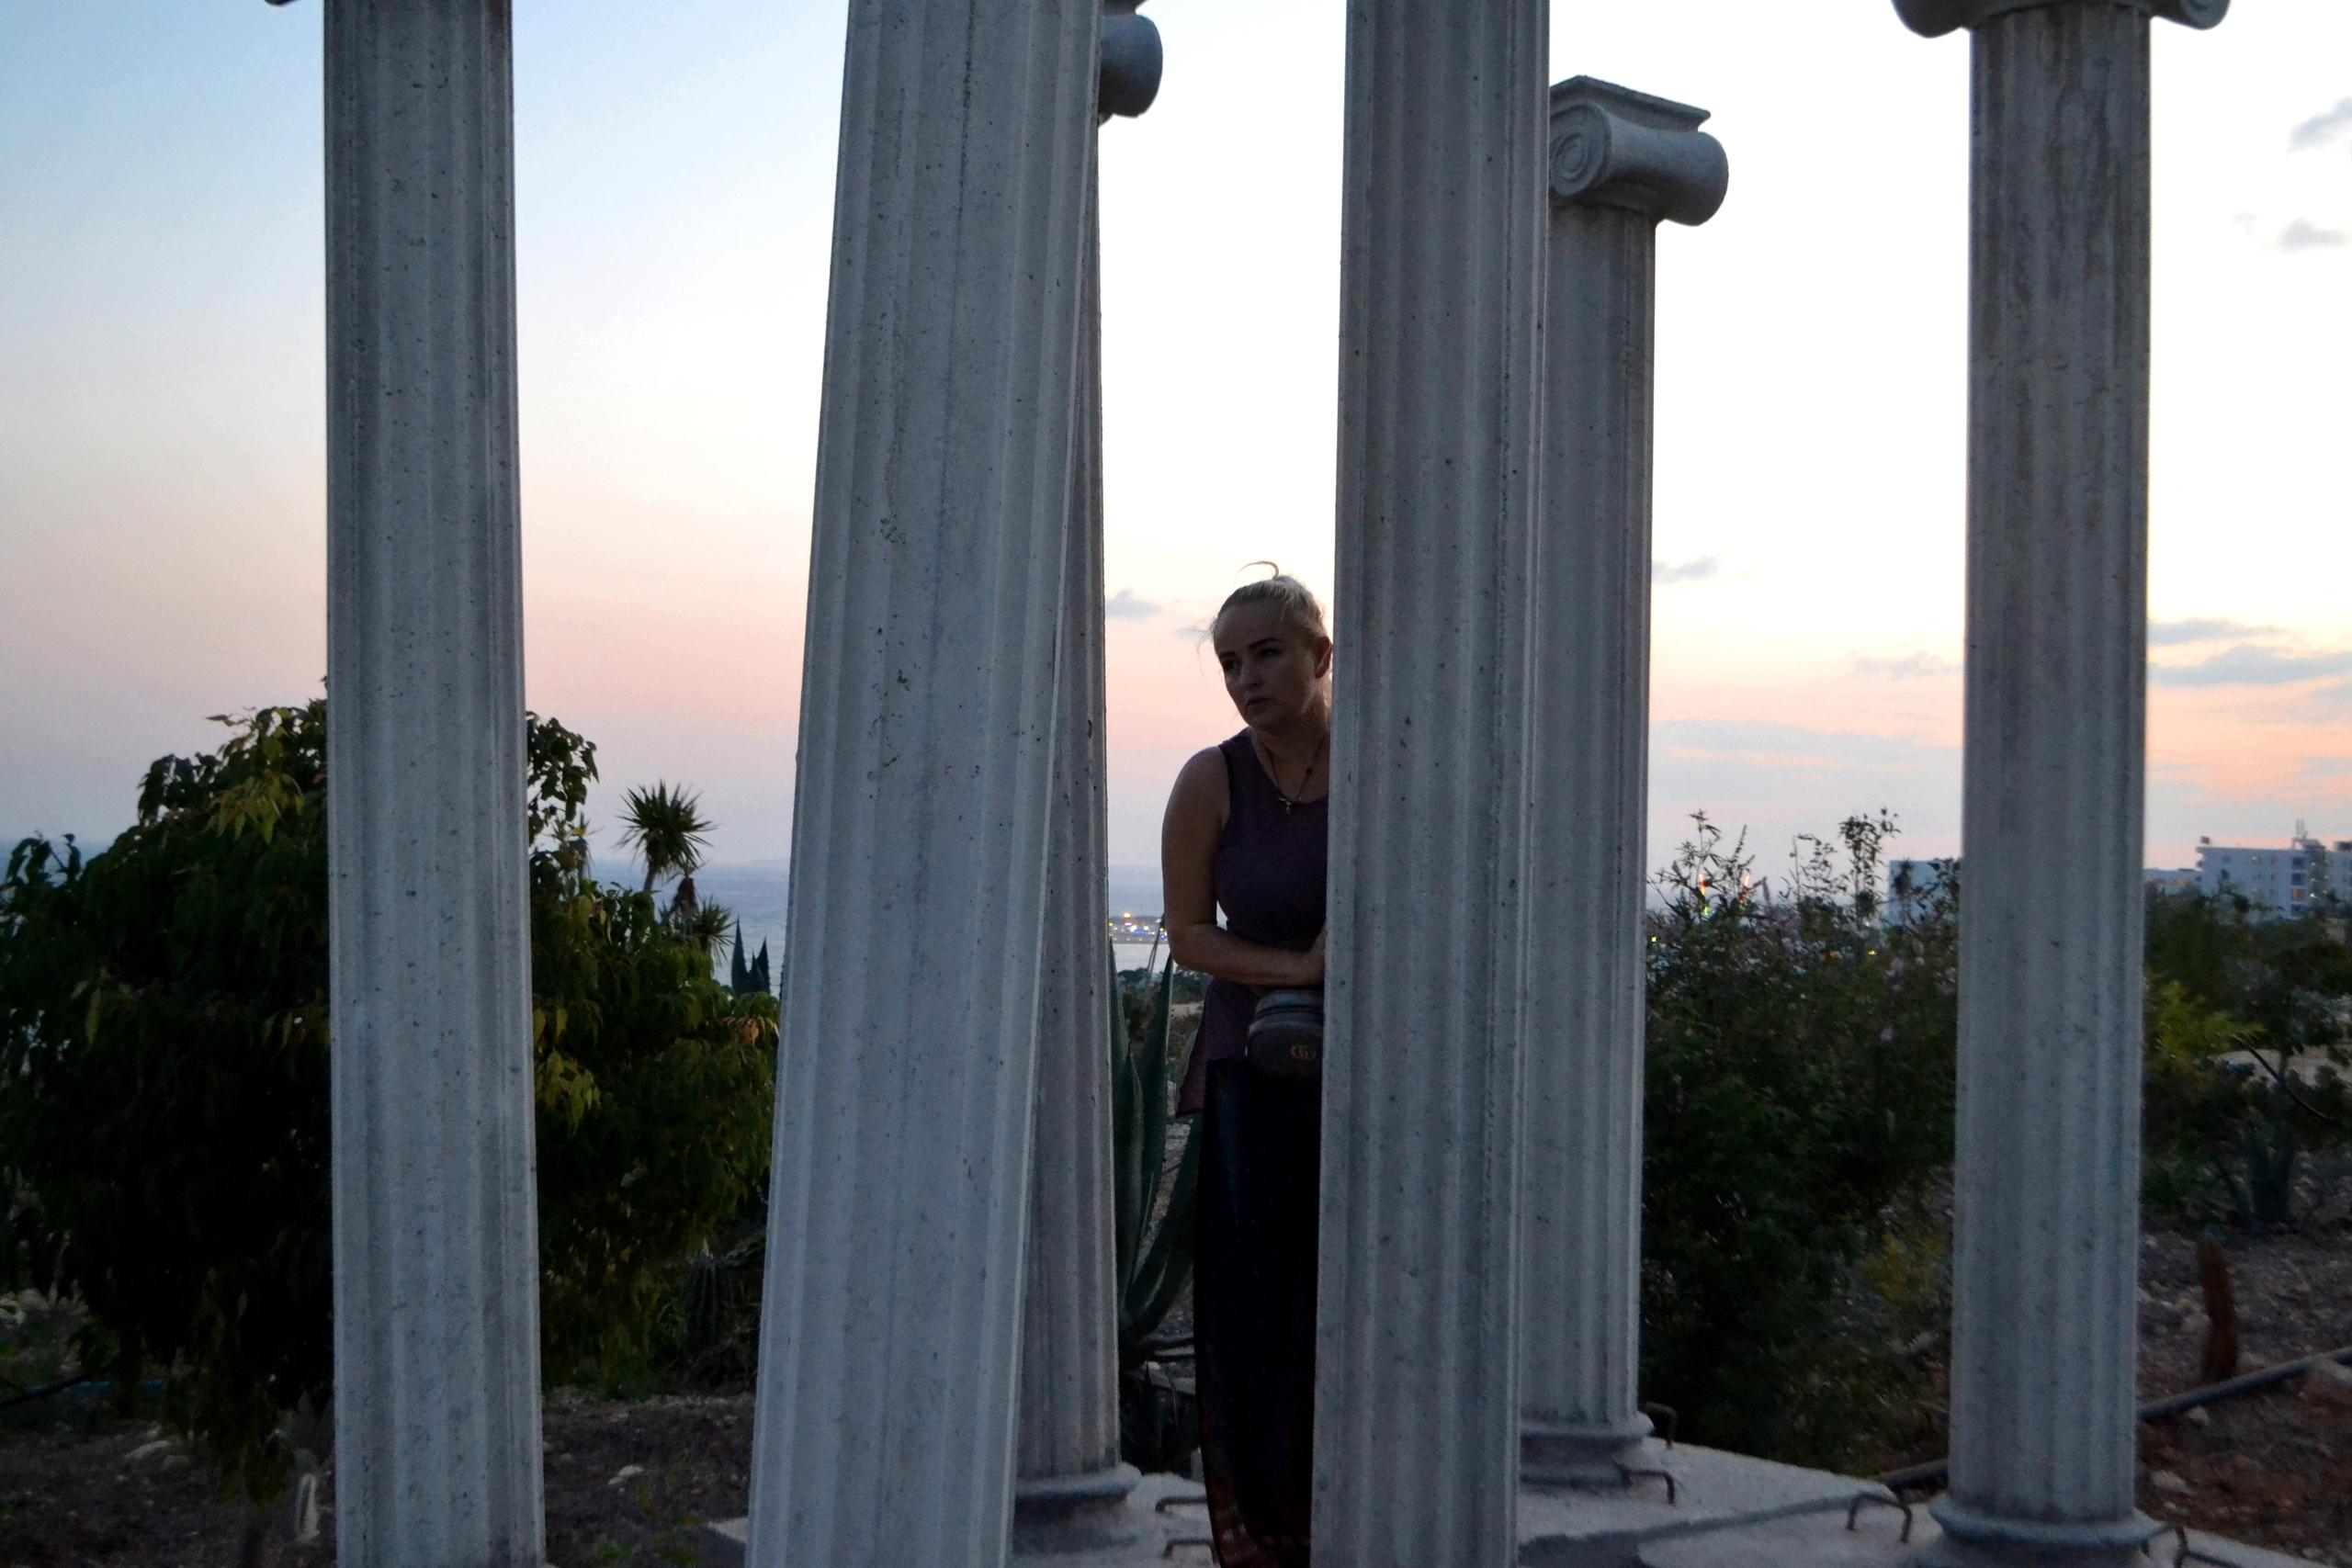 Елена Руденко (Валтея). Кипр. Парк скульптур (фото). - Страница 2 YFhJkFyq1Rk